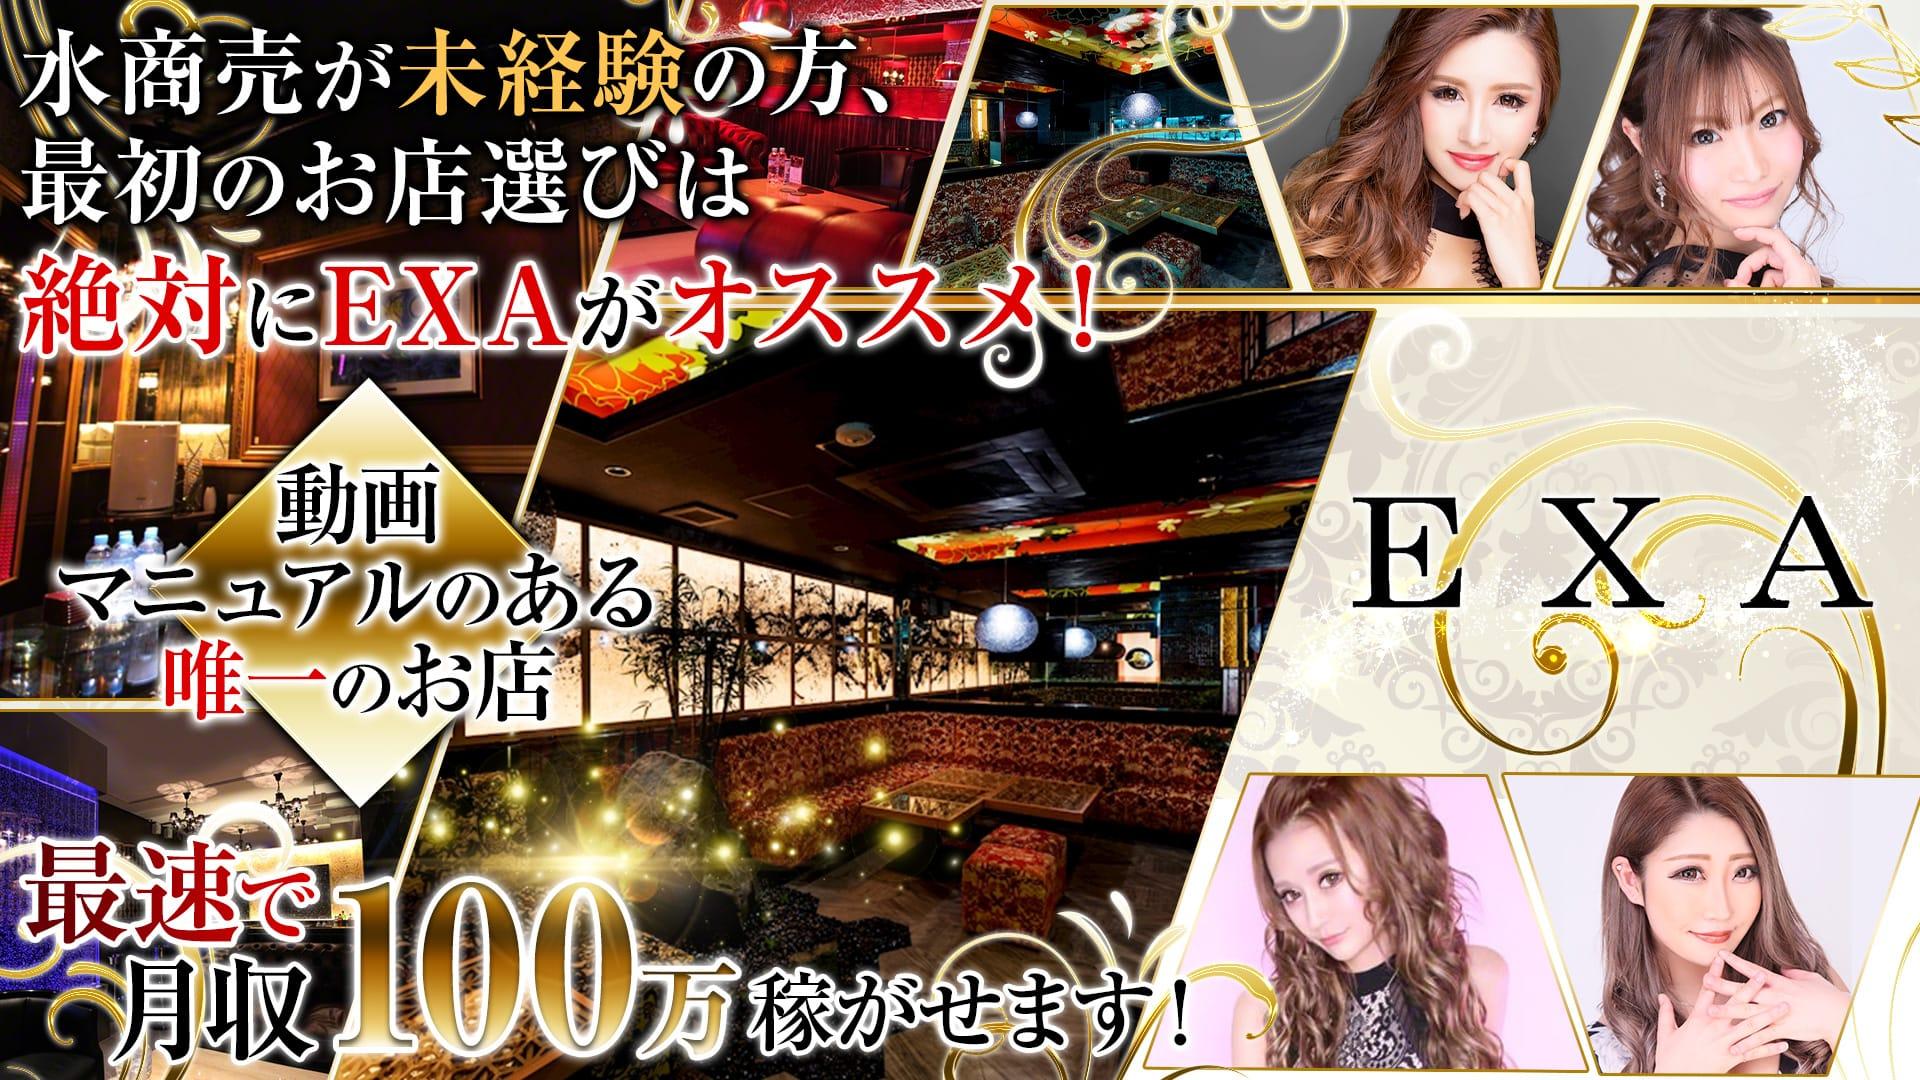 Club EXA(エグザ) 柏キャバクラ TOP画像